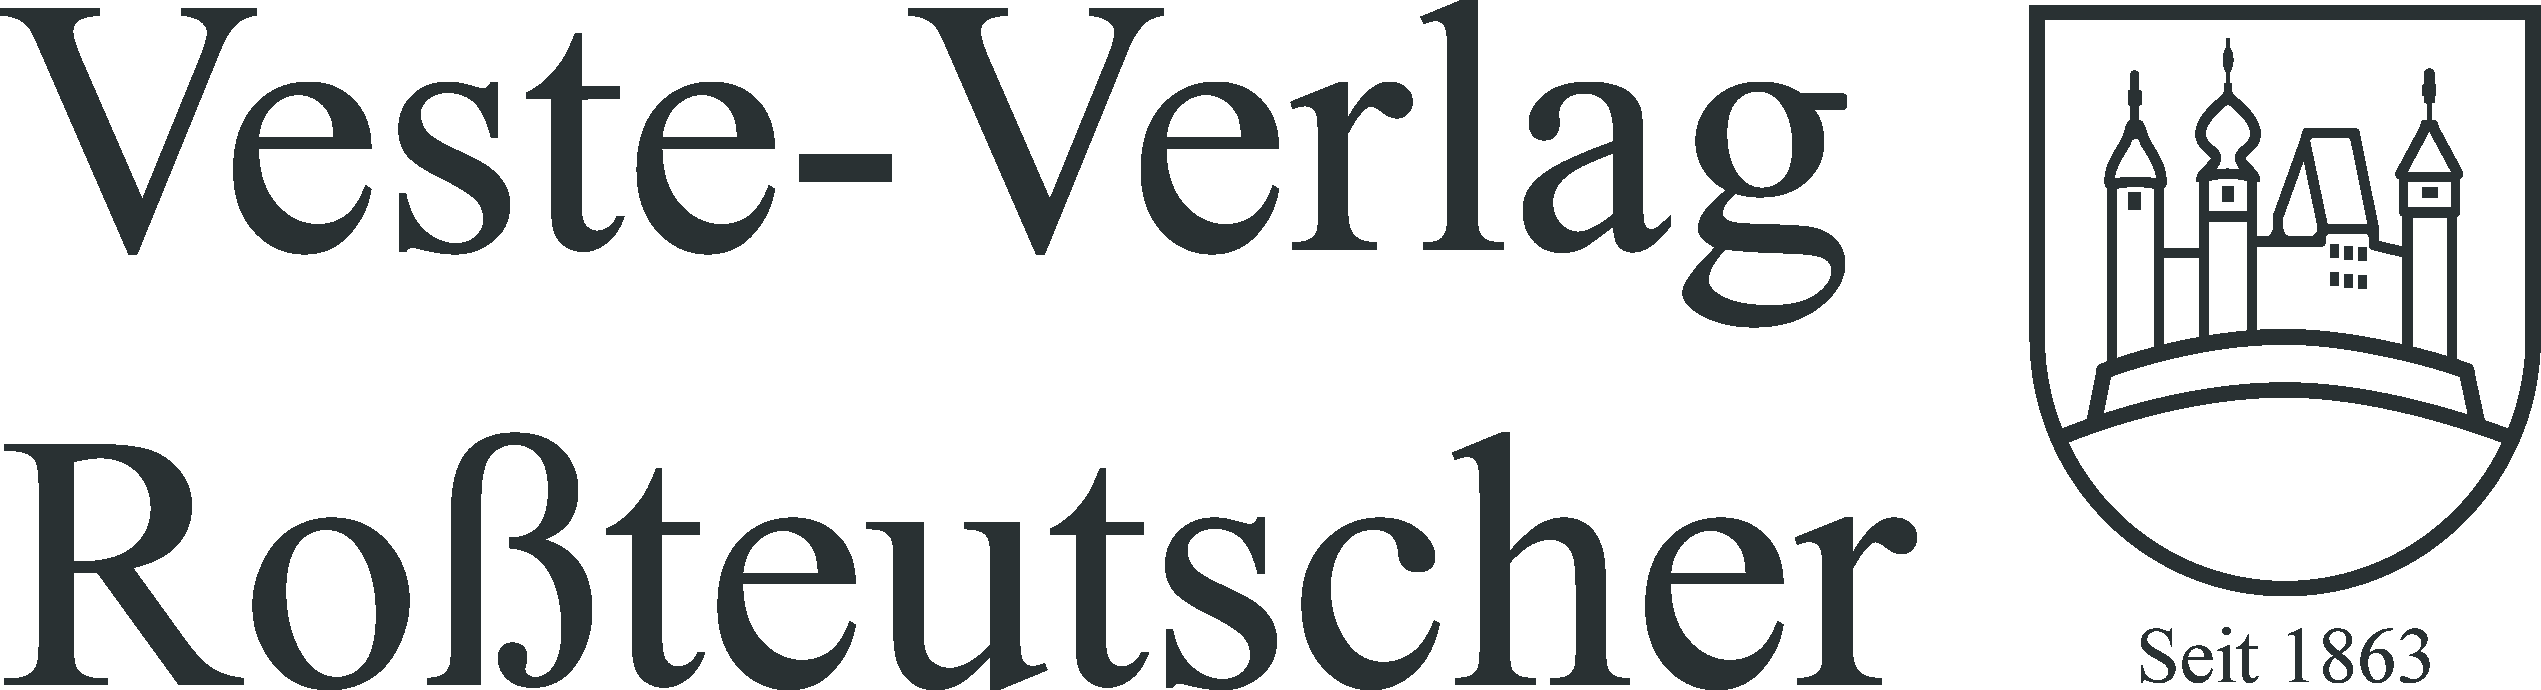 Veste-Verlag Roßteutscher